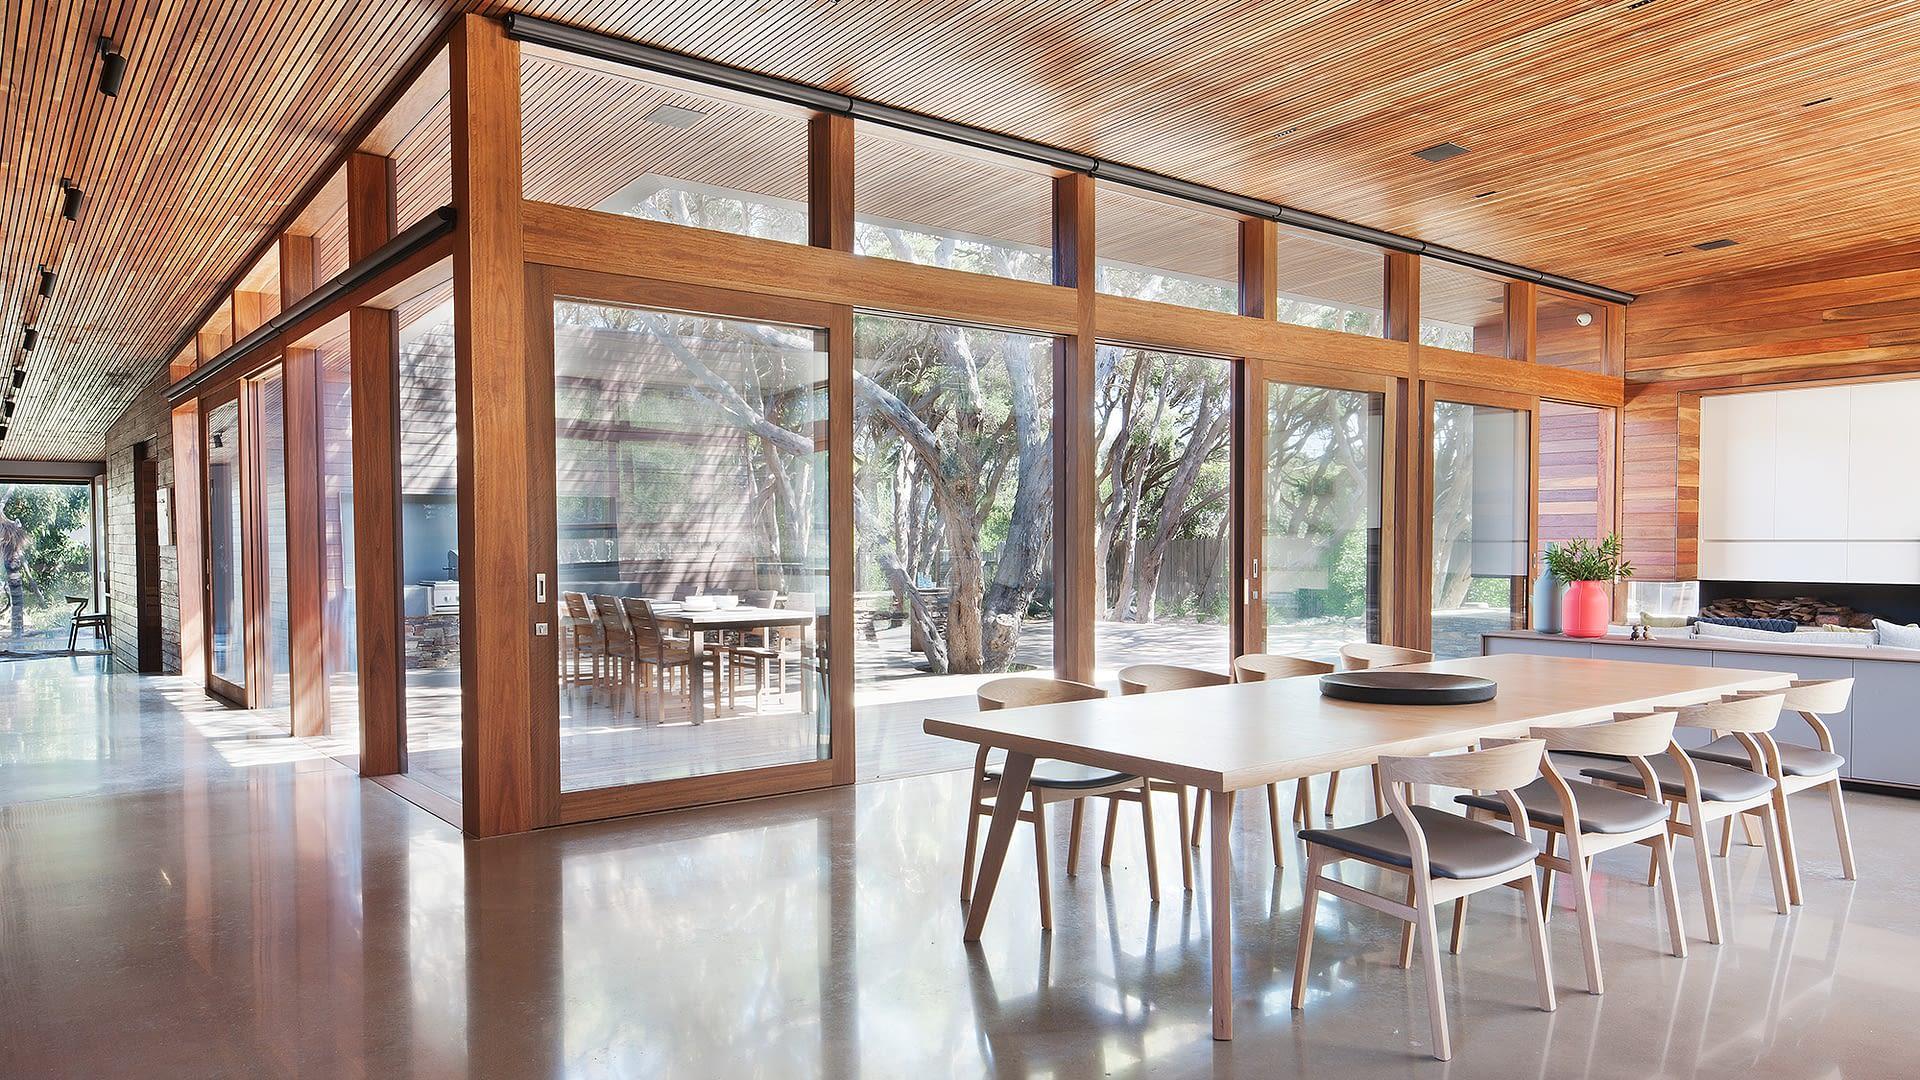 Bedont_kalea_chair_hayball_point_lonsdale_residential_australia